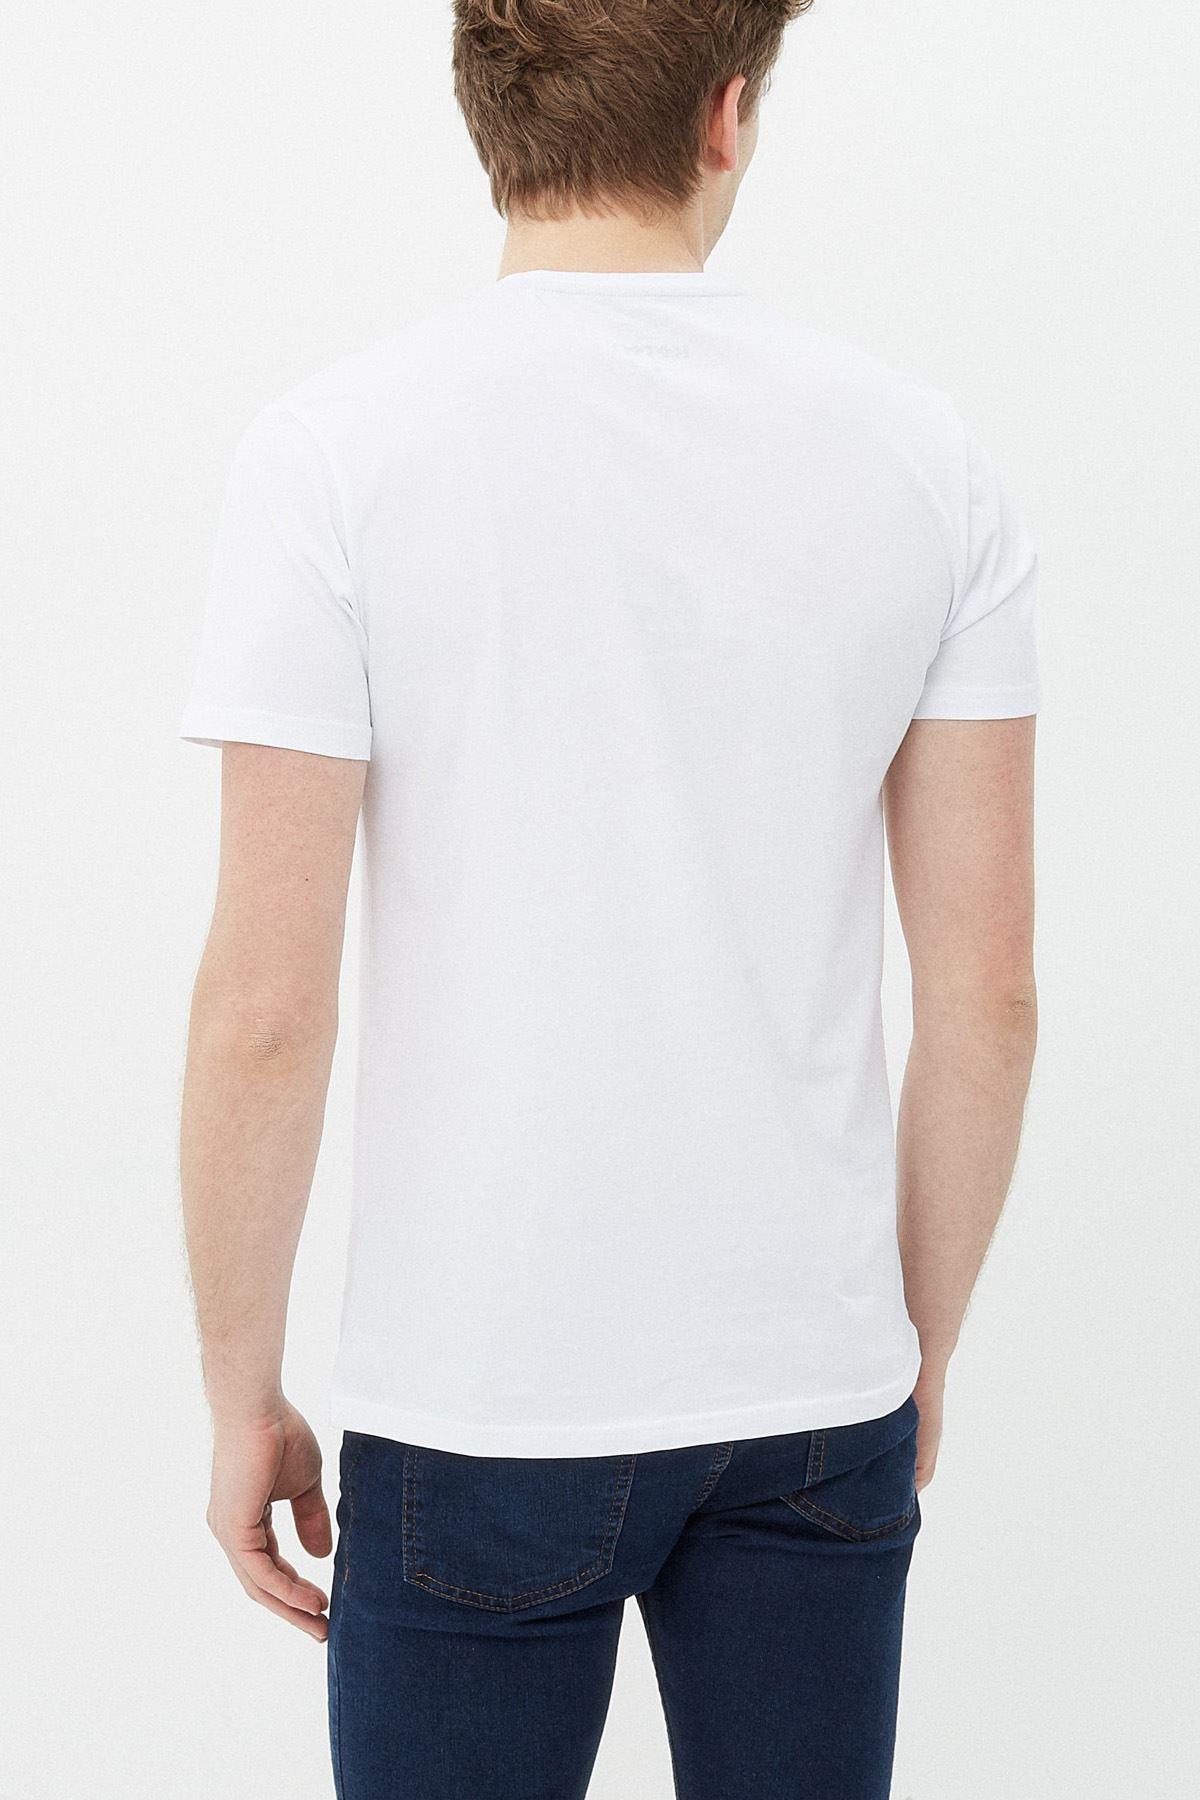 Anime Death Note 06 Beyaz Erkek Tshirt - Tişört